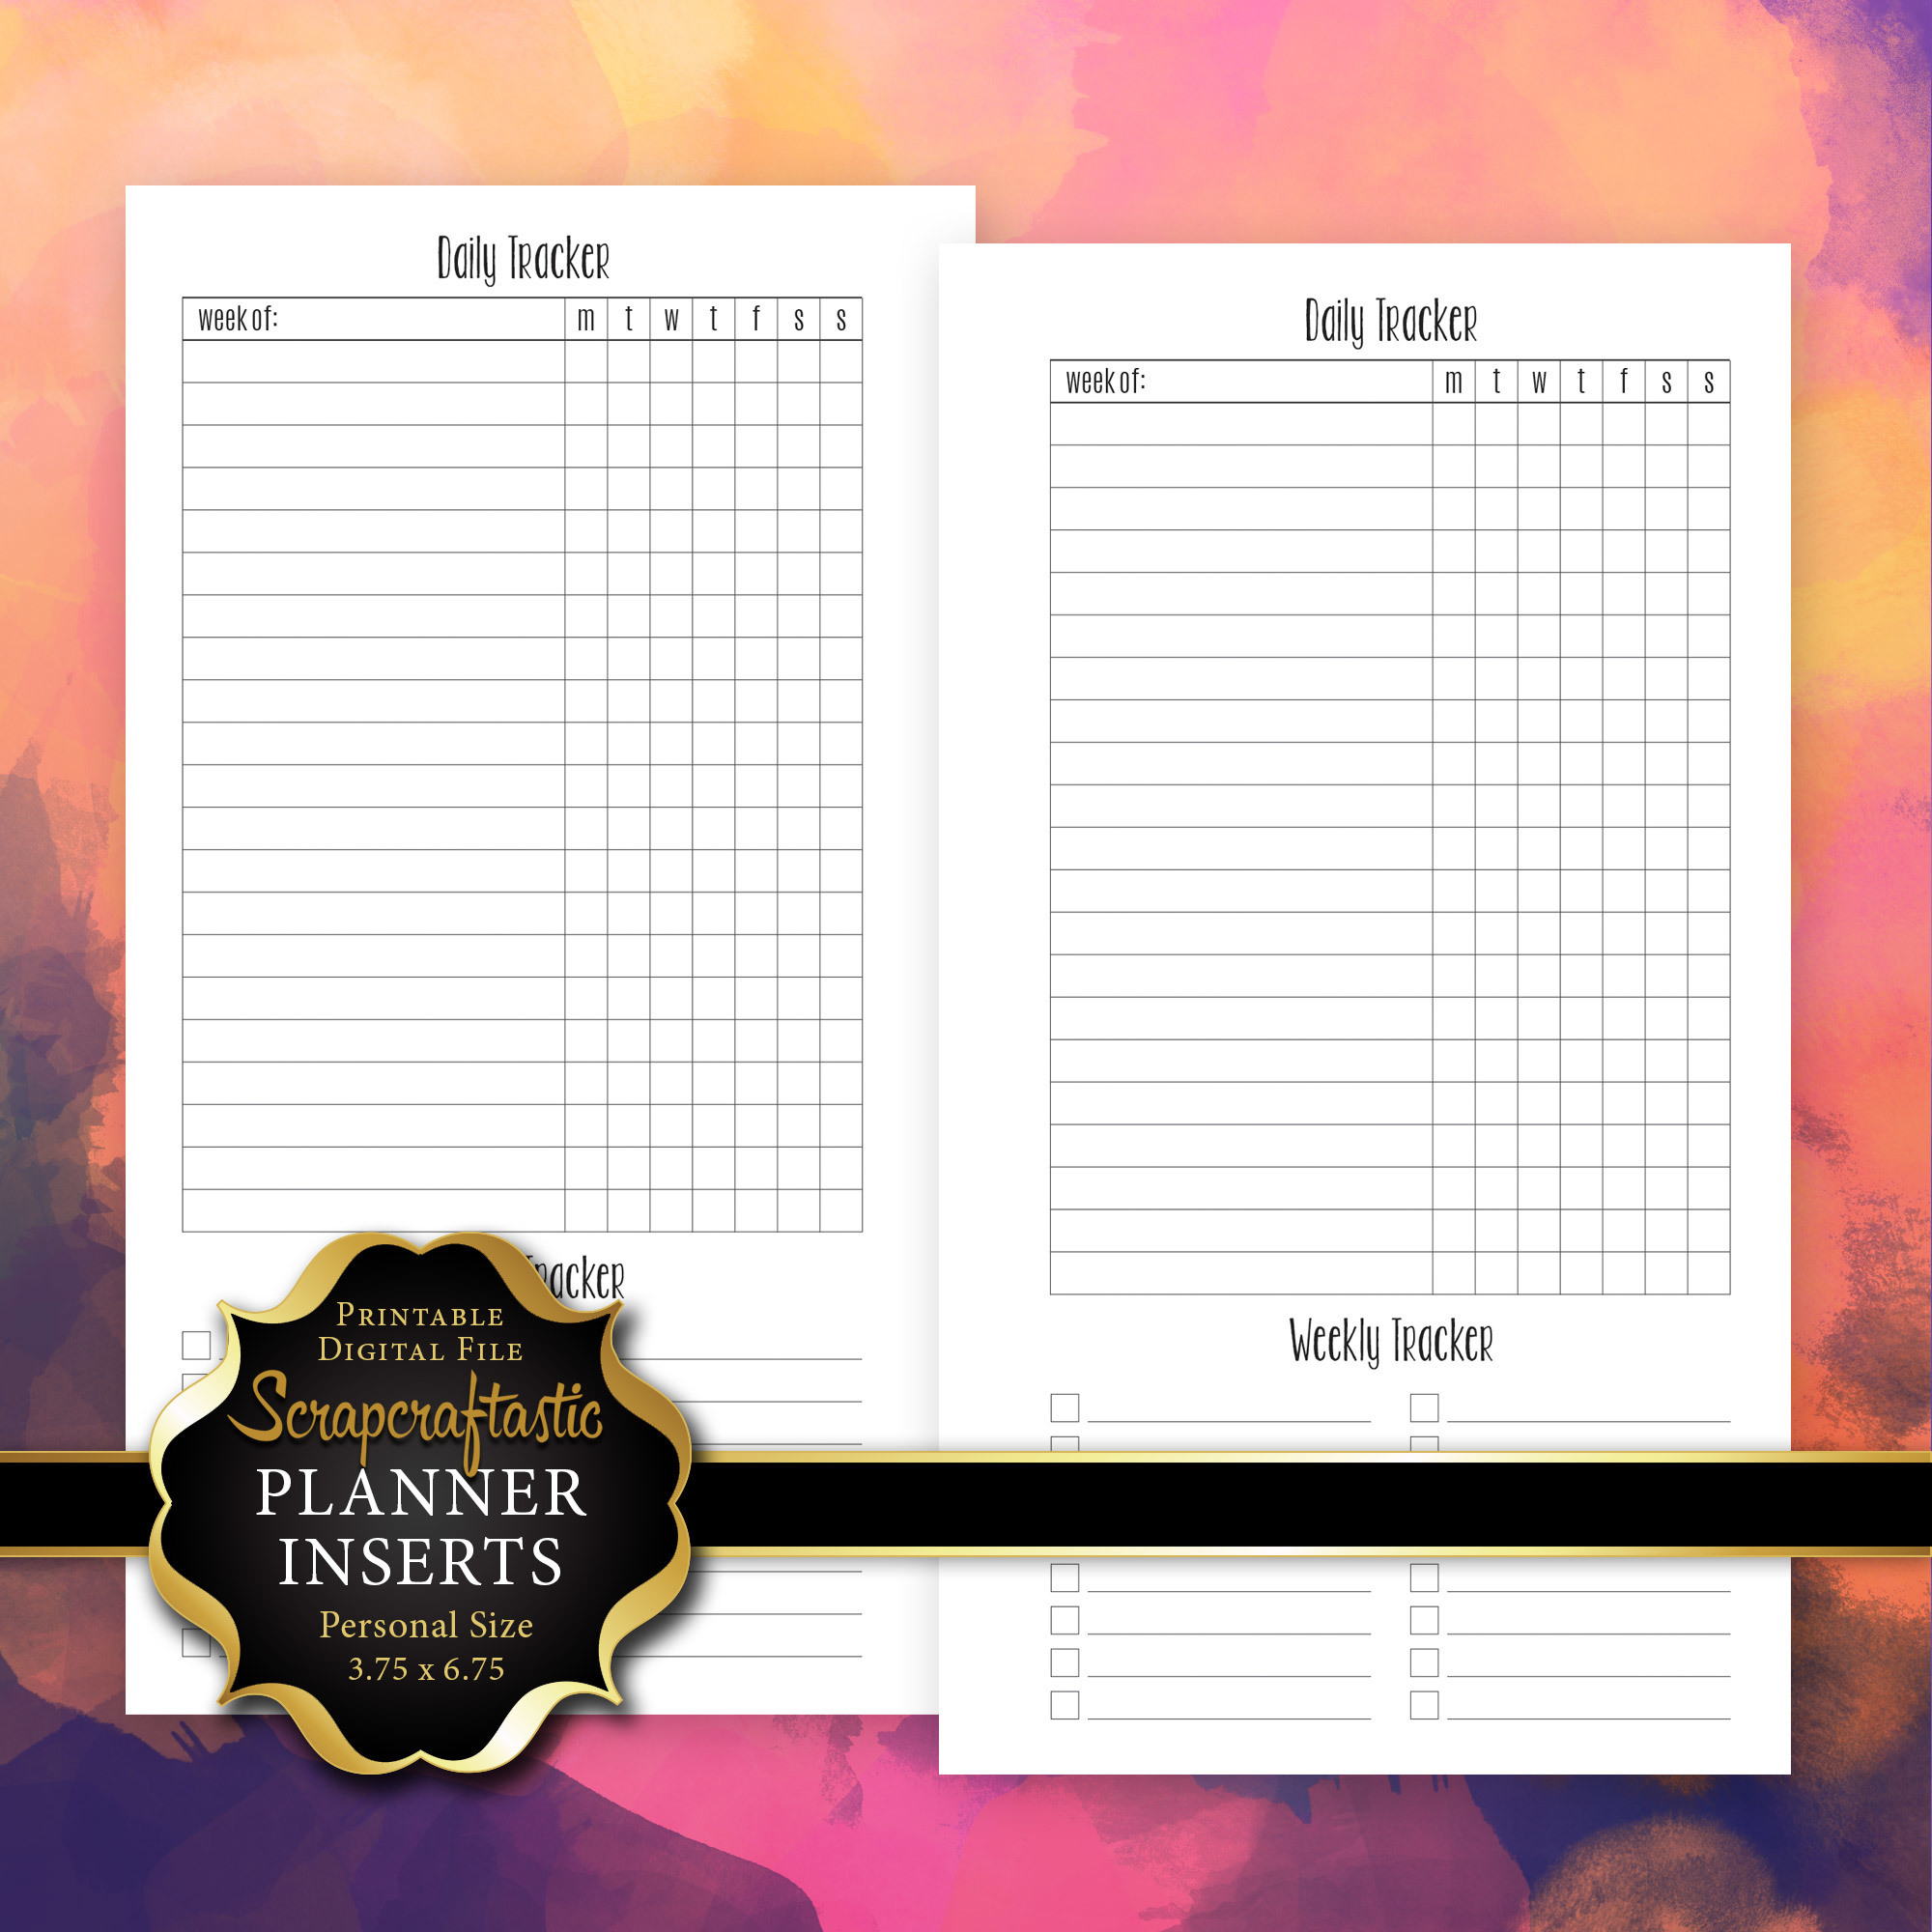 Daily Habit/Task Tracker Planner Printable Insert Refill Personal Size - Filofax, Kikki K, ColorCrush 00210